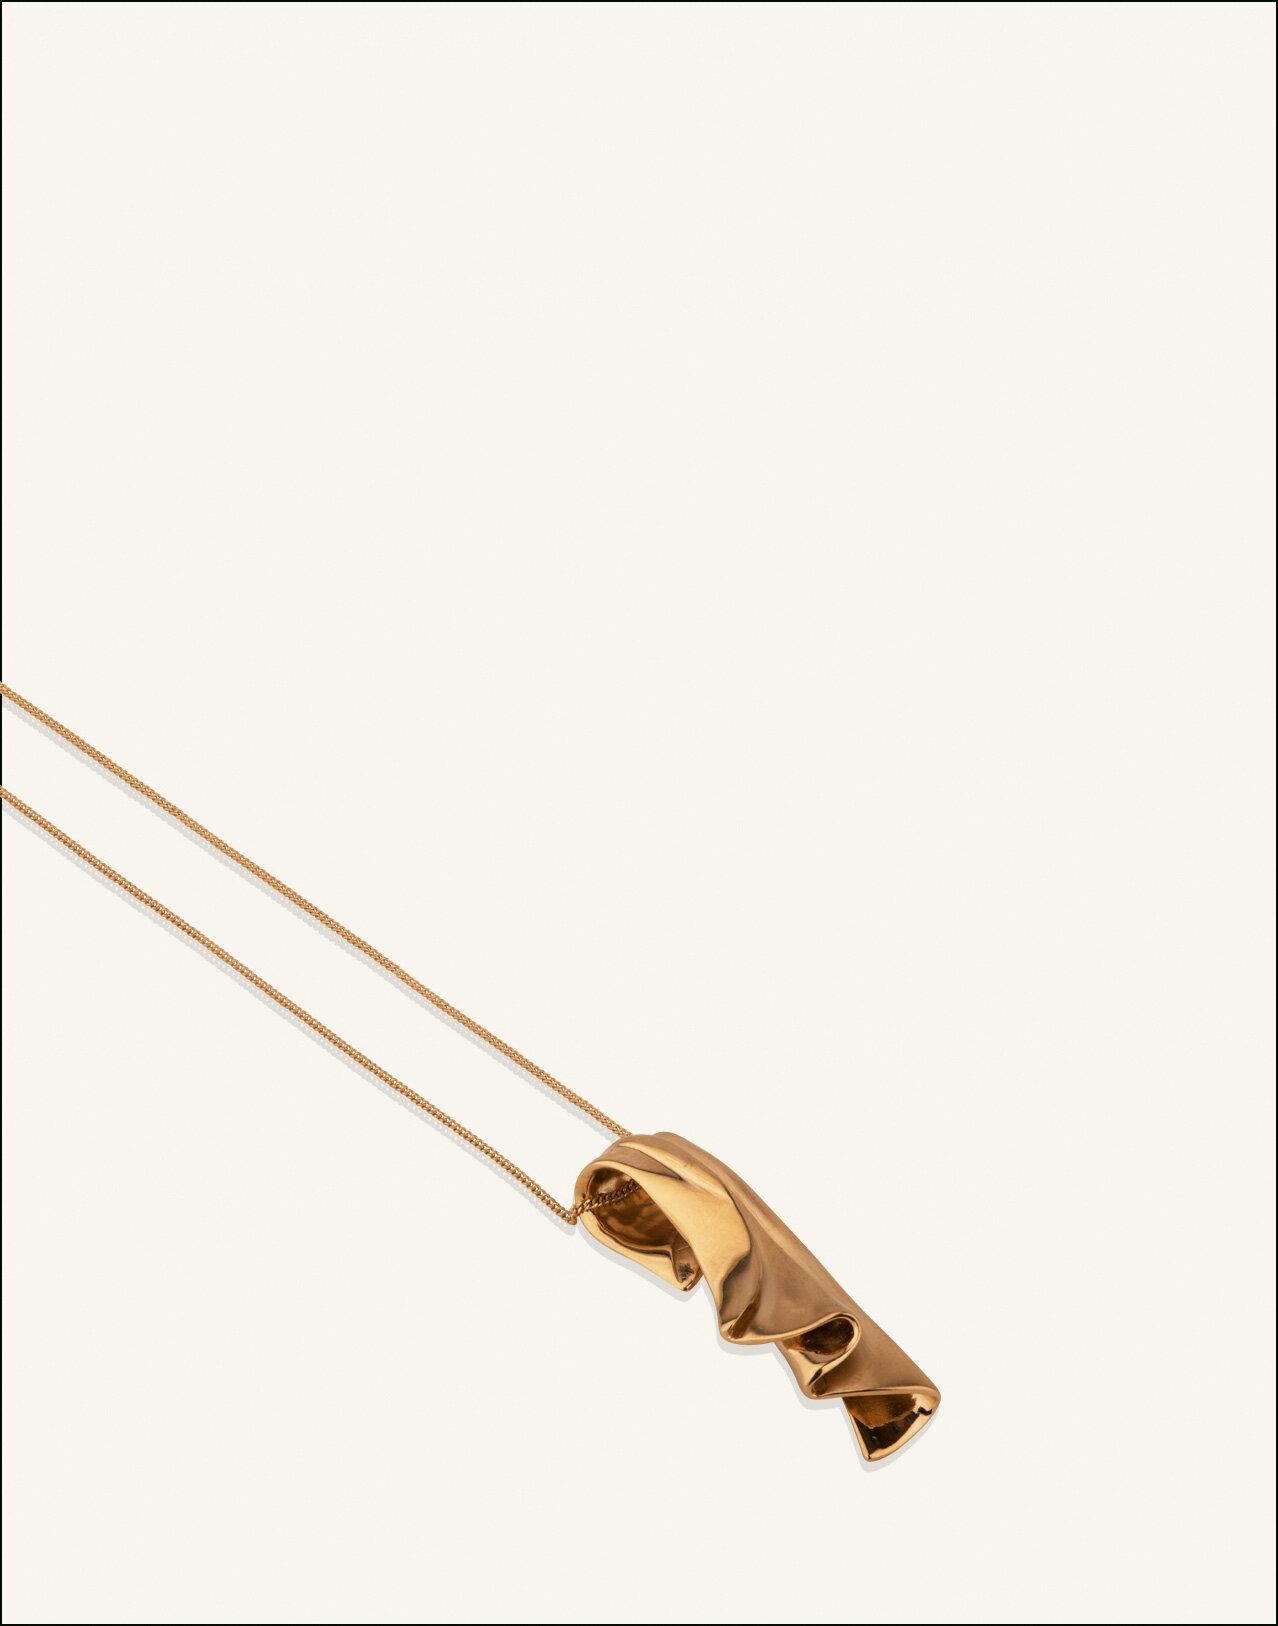 Completedworks-Gold-Vermeil-Pendant-The-Great-Cowboy-Strike-2.jpg